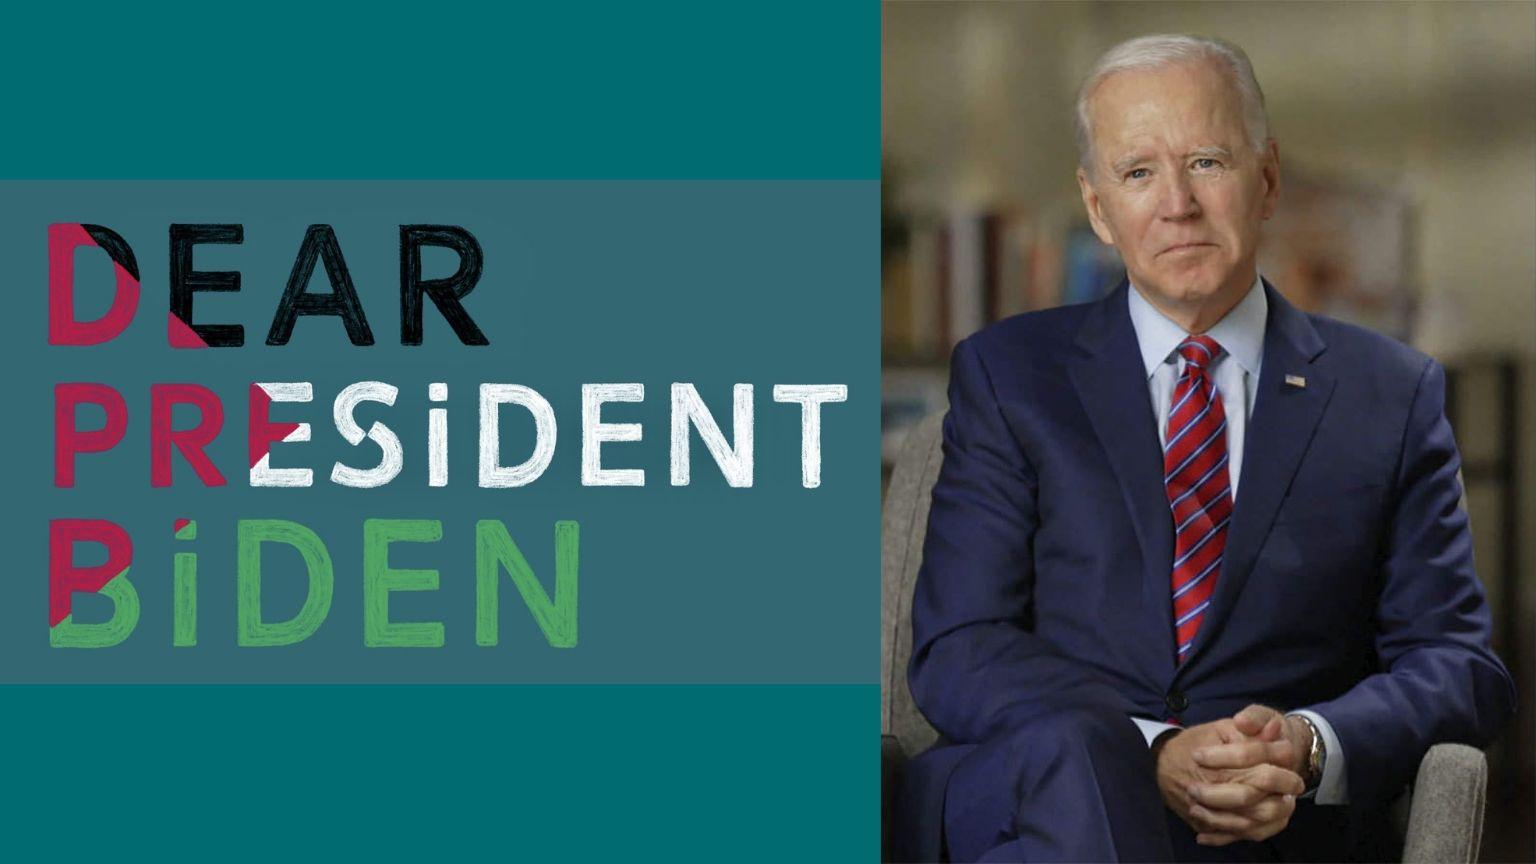 Over 500 Democratic staffers urge Joe Biden to 'hold Israel accountable'